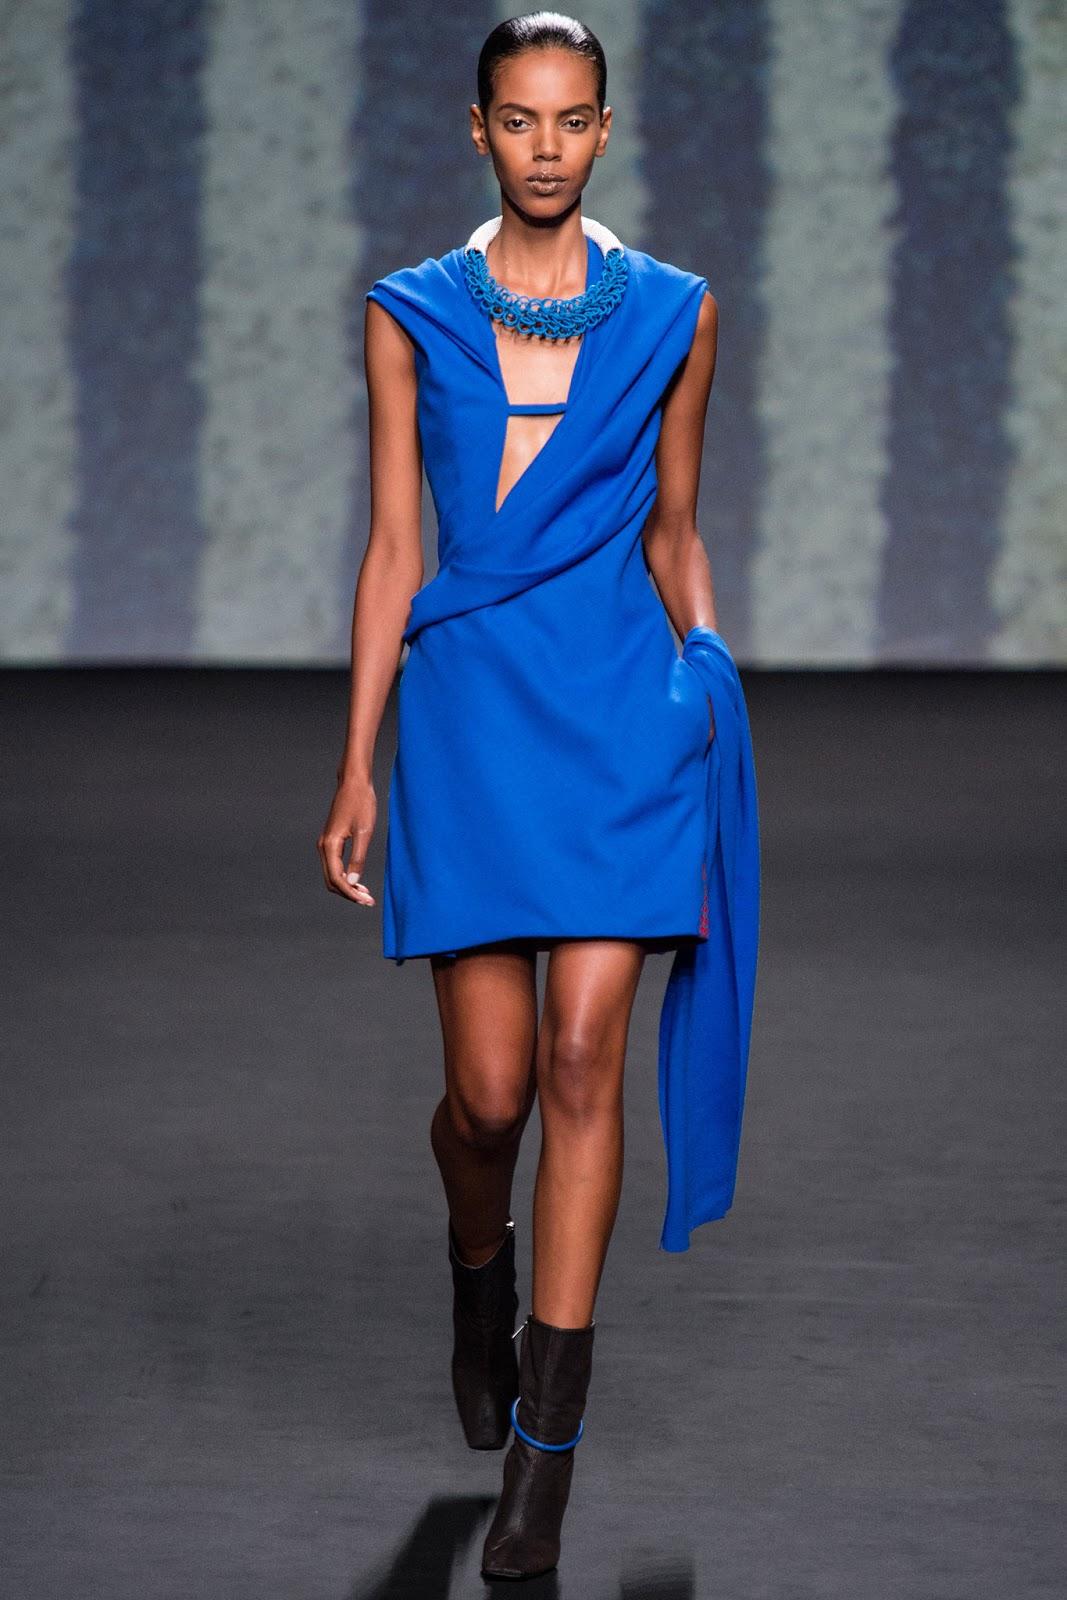 Christian Dior Haute Couture Fall 2014   Christian Dior ...  Christian Dior Haute Couture 2014